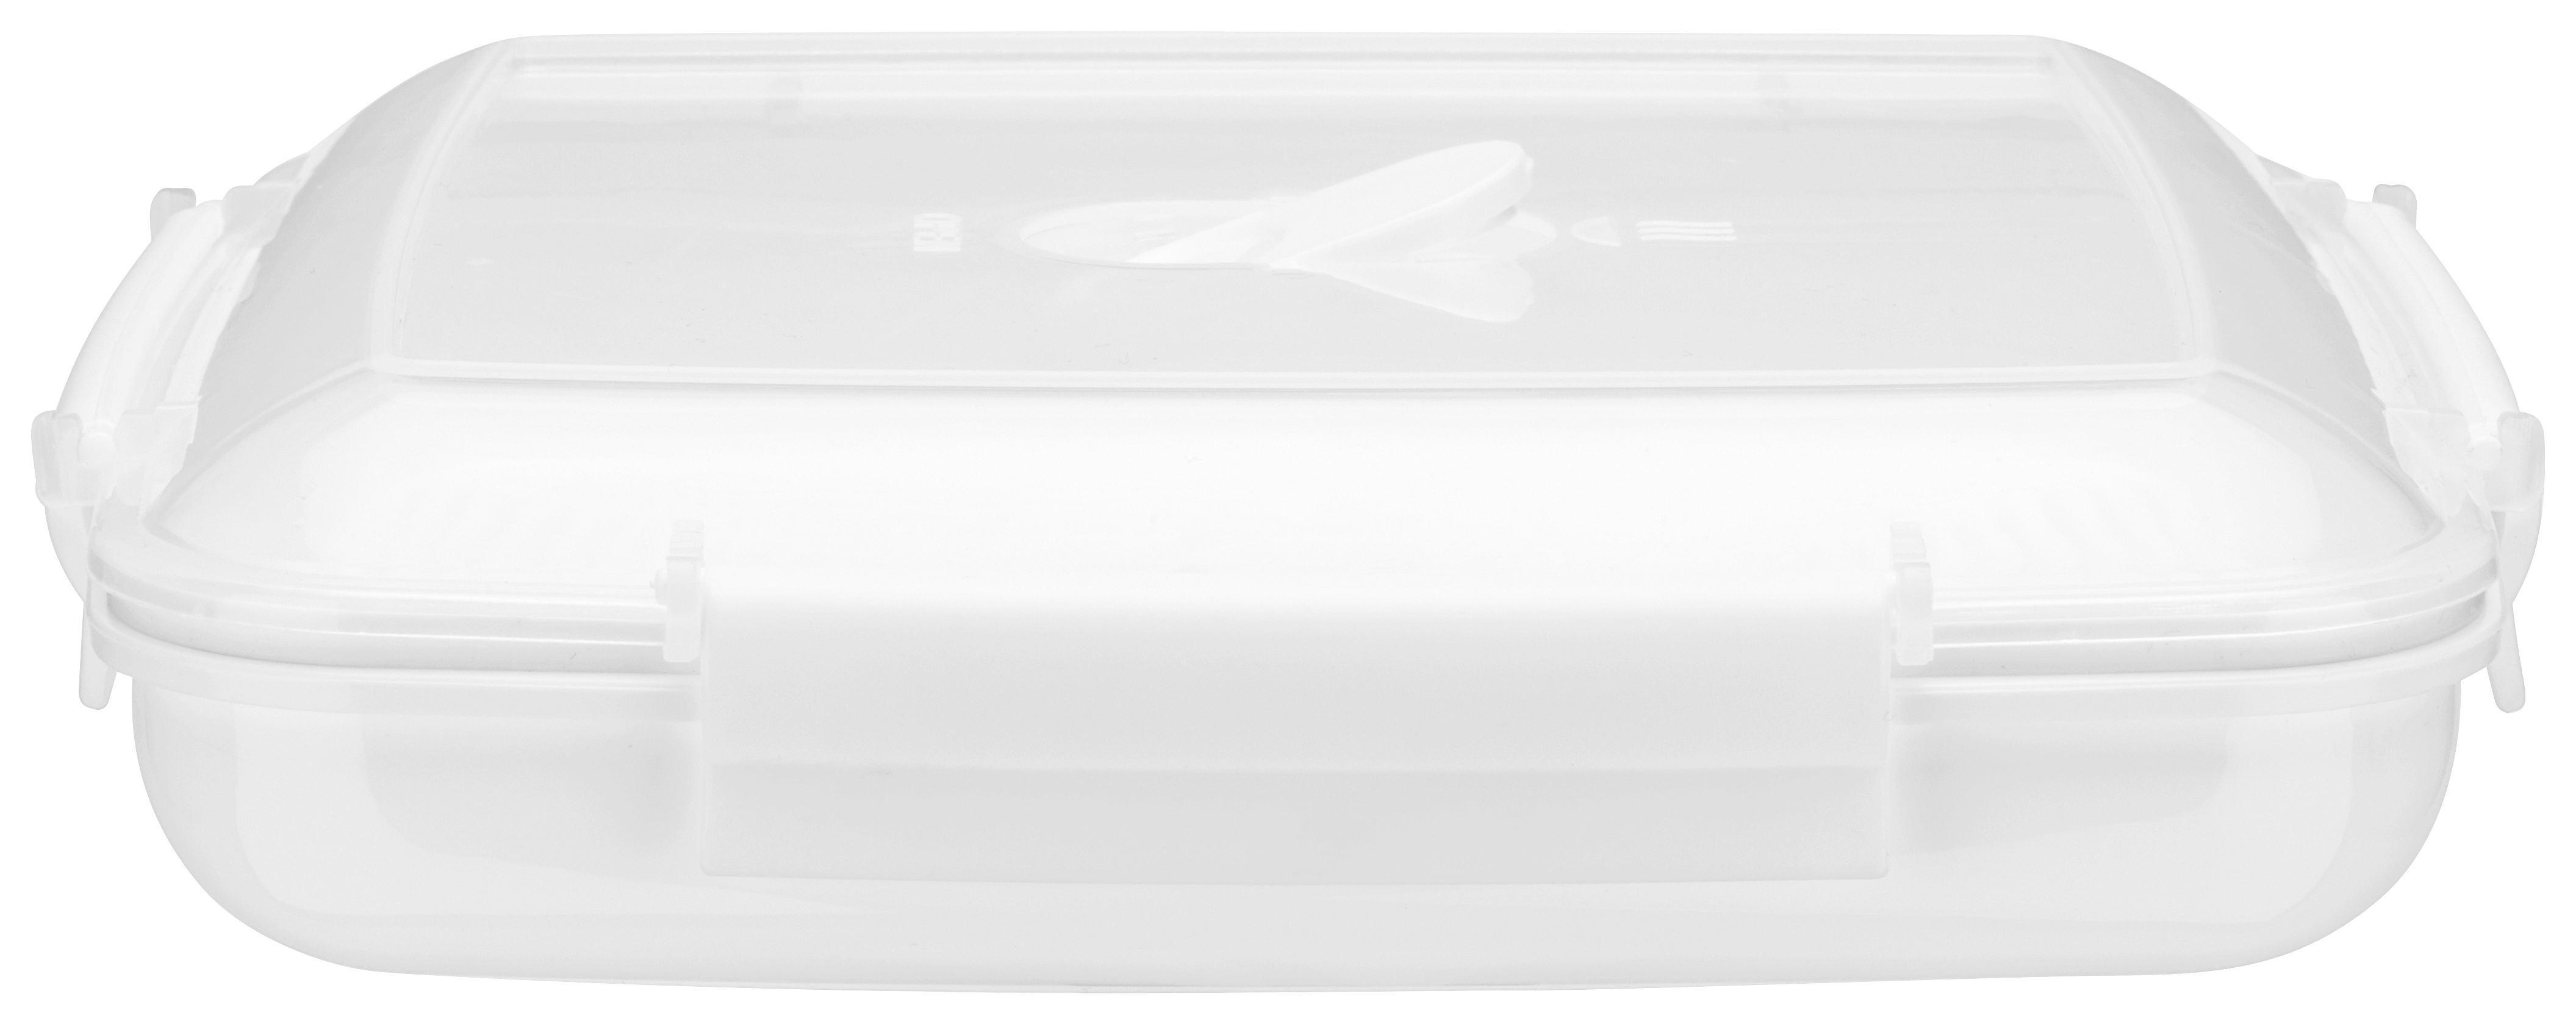 Mikrowellendose Mikka in Weiß, ca. 880ml - Transparent/Weiß, Kunststoff (0,88l) - MÖMAX modern living